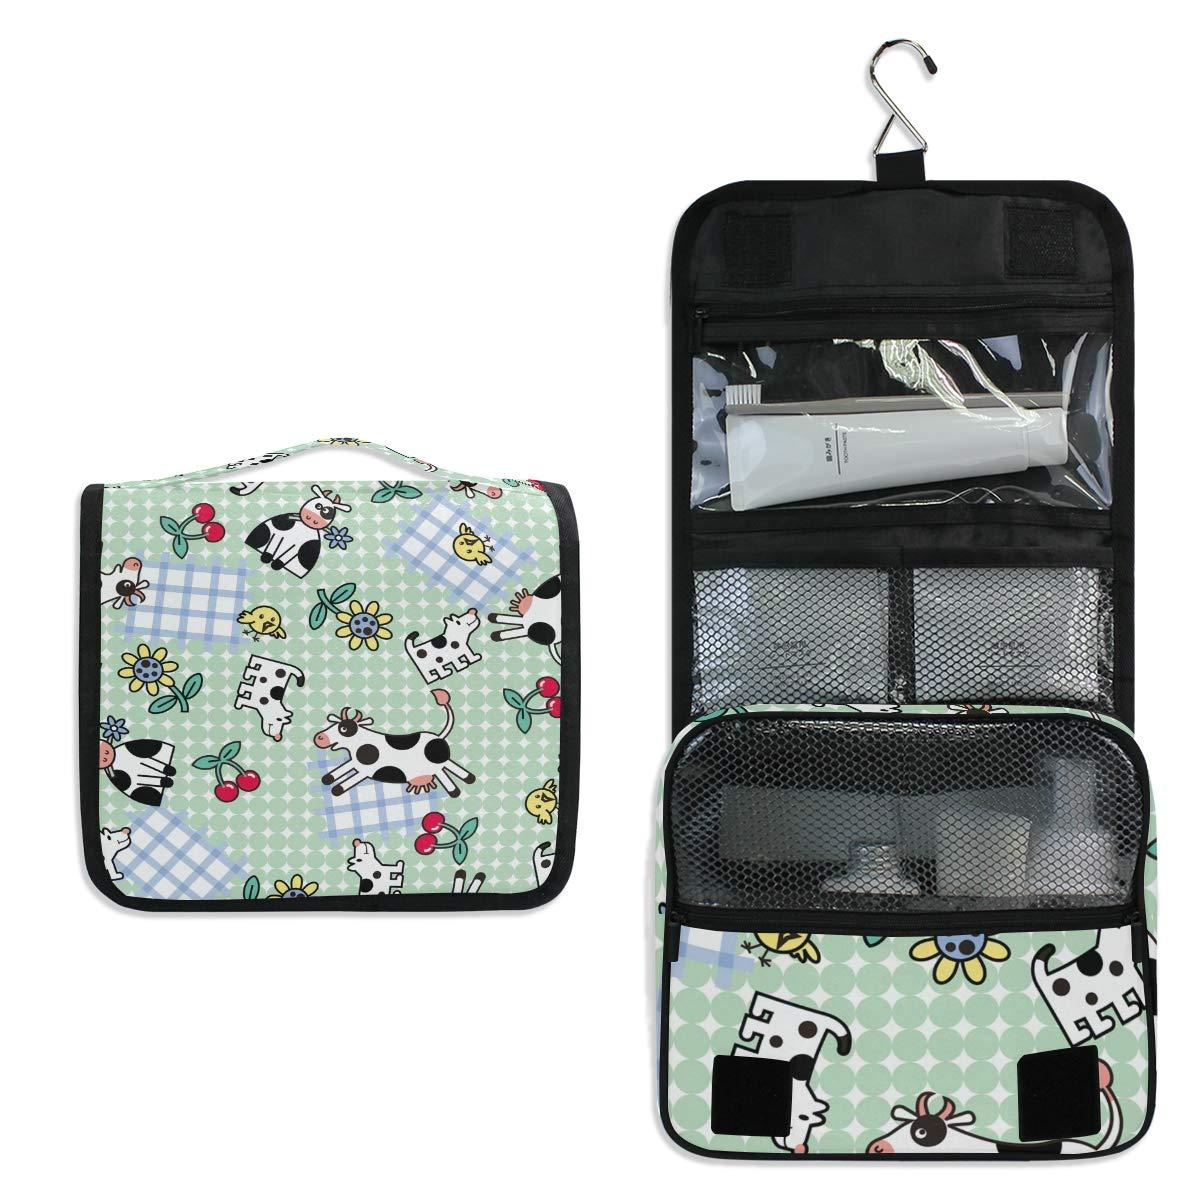 Cartoon Milk Cow Hanging Foldable Toiletry Cosmetic Makeup Bag Travel Kit Organizer Storage Wash Bags Case for Women Girls Bathroom